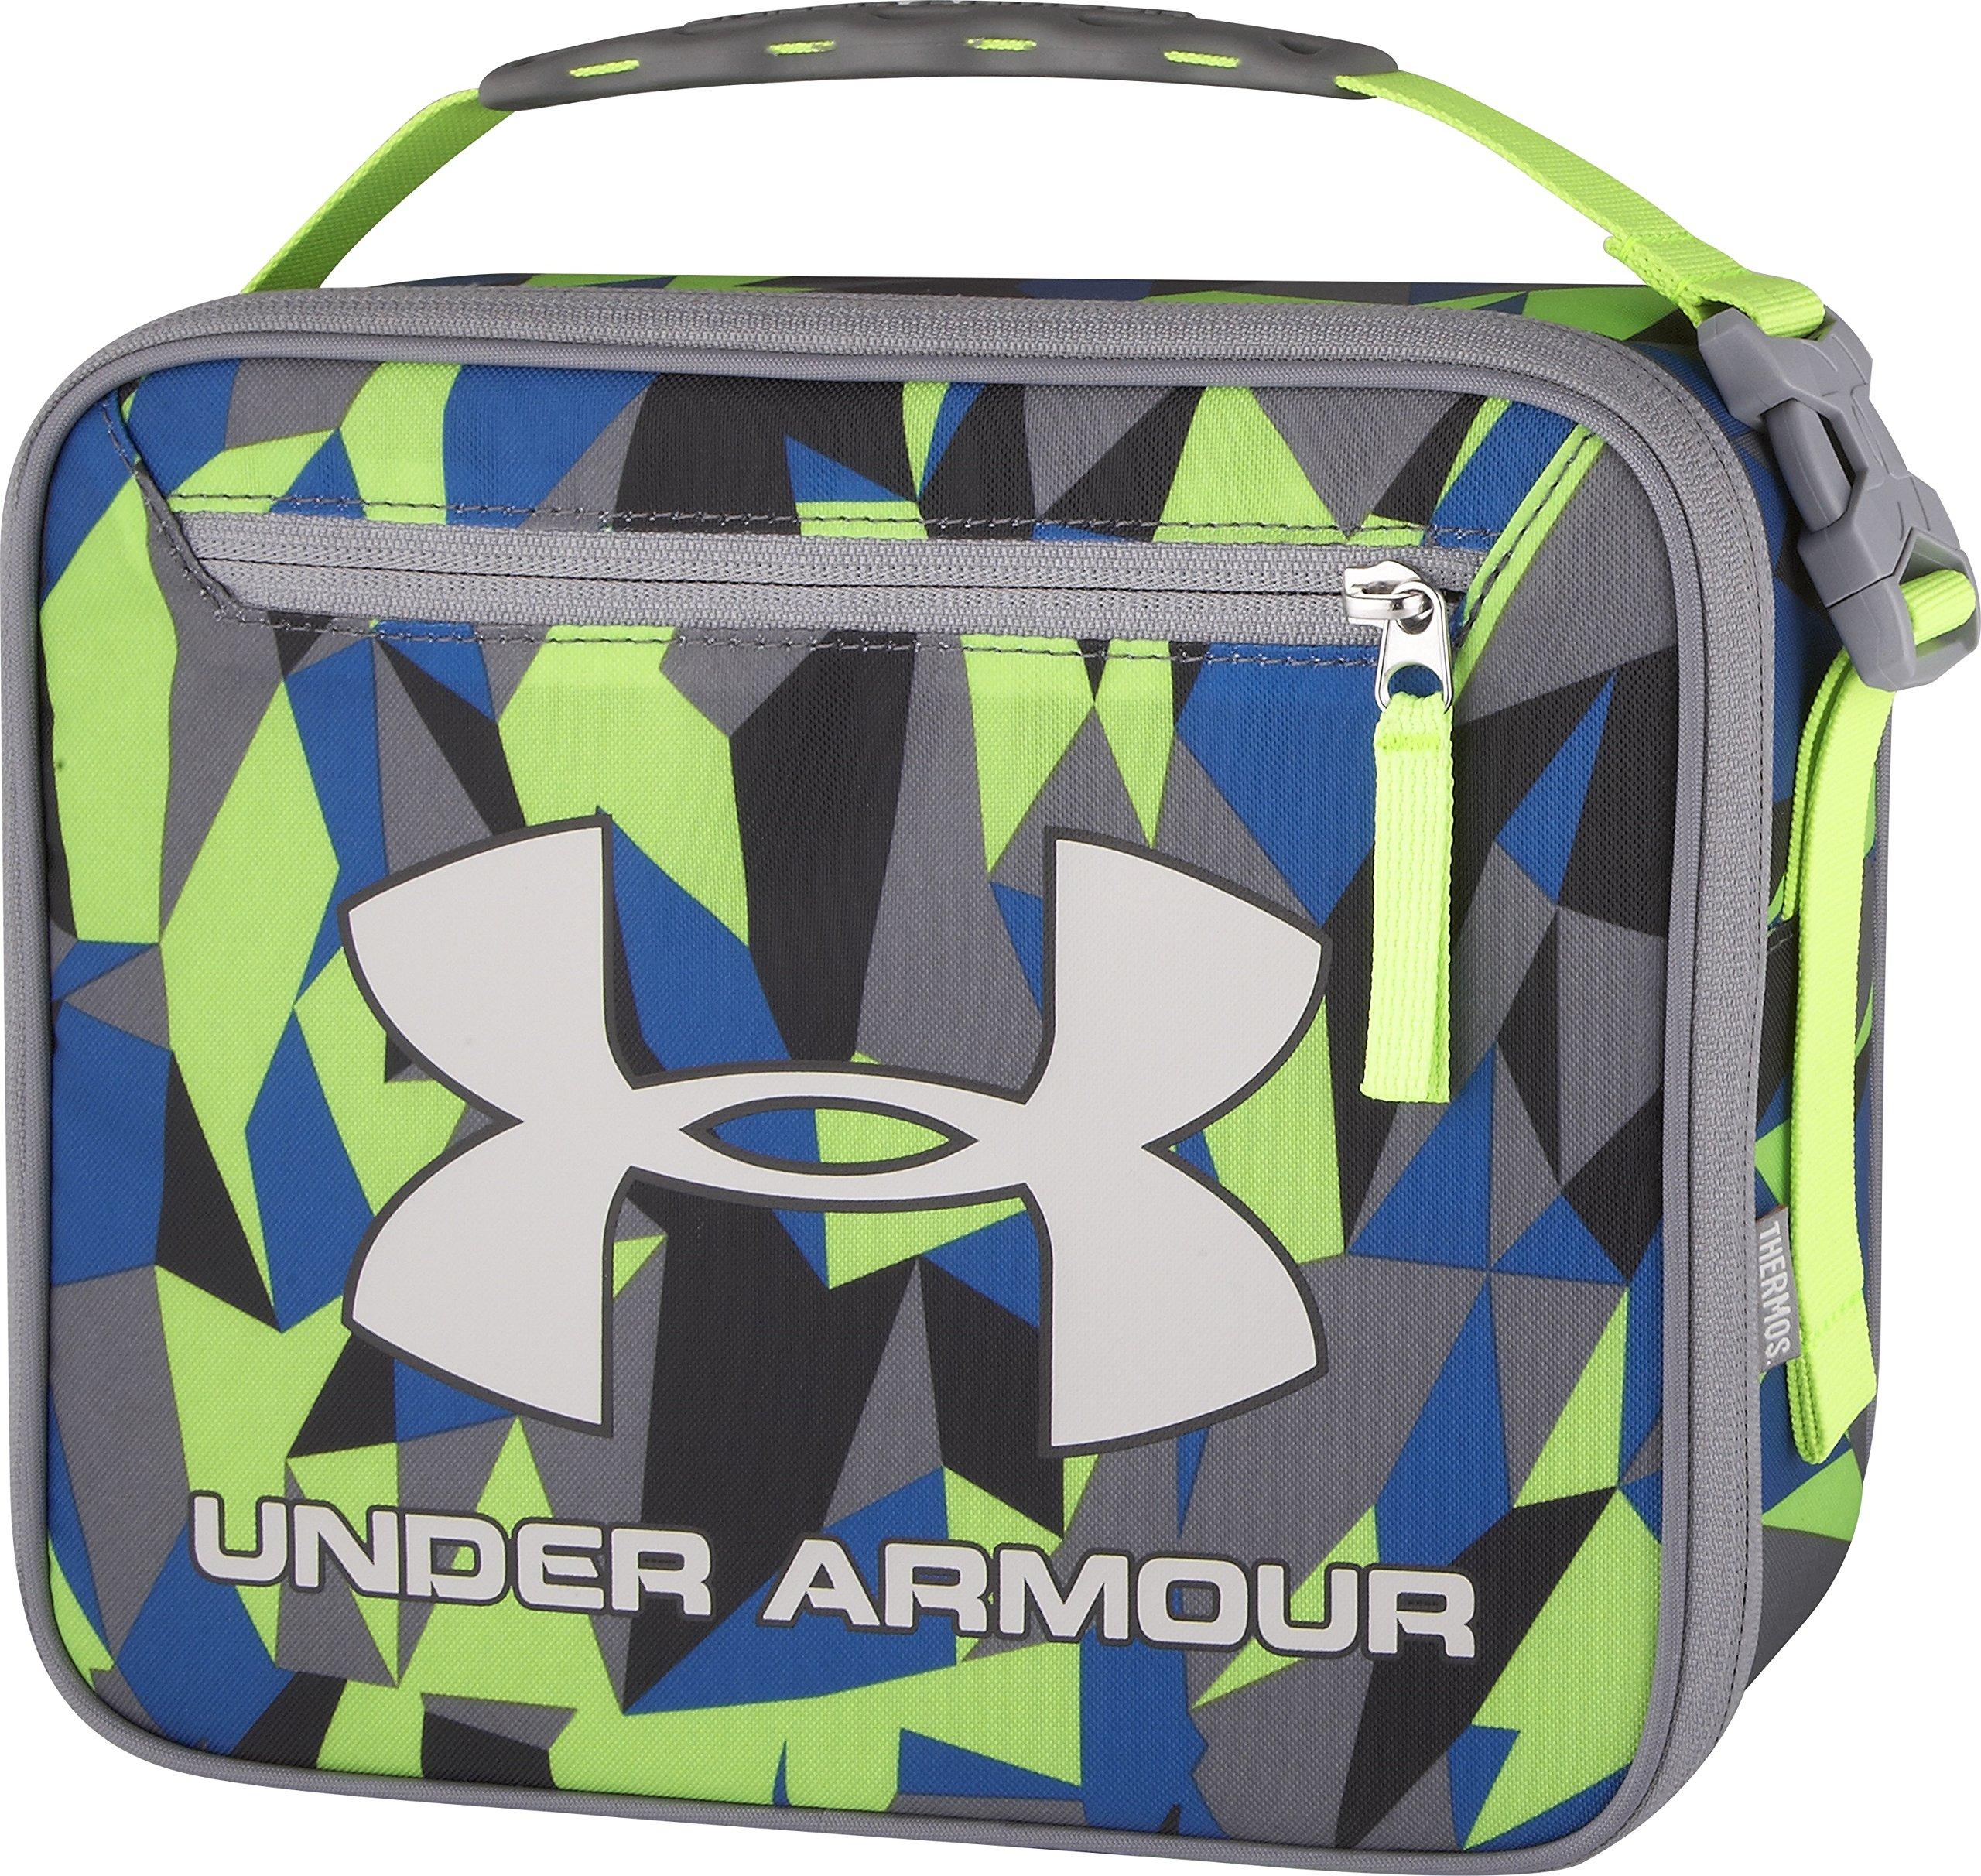 711d81e9d5 Details about Geo Cache Gray Sport Under Armour Lunch Box Bag IsoTec  Premium Foam Insulation